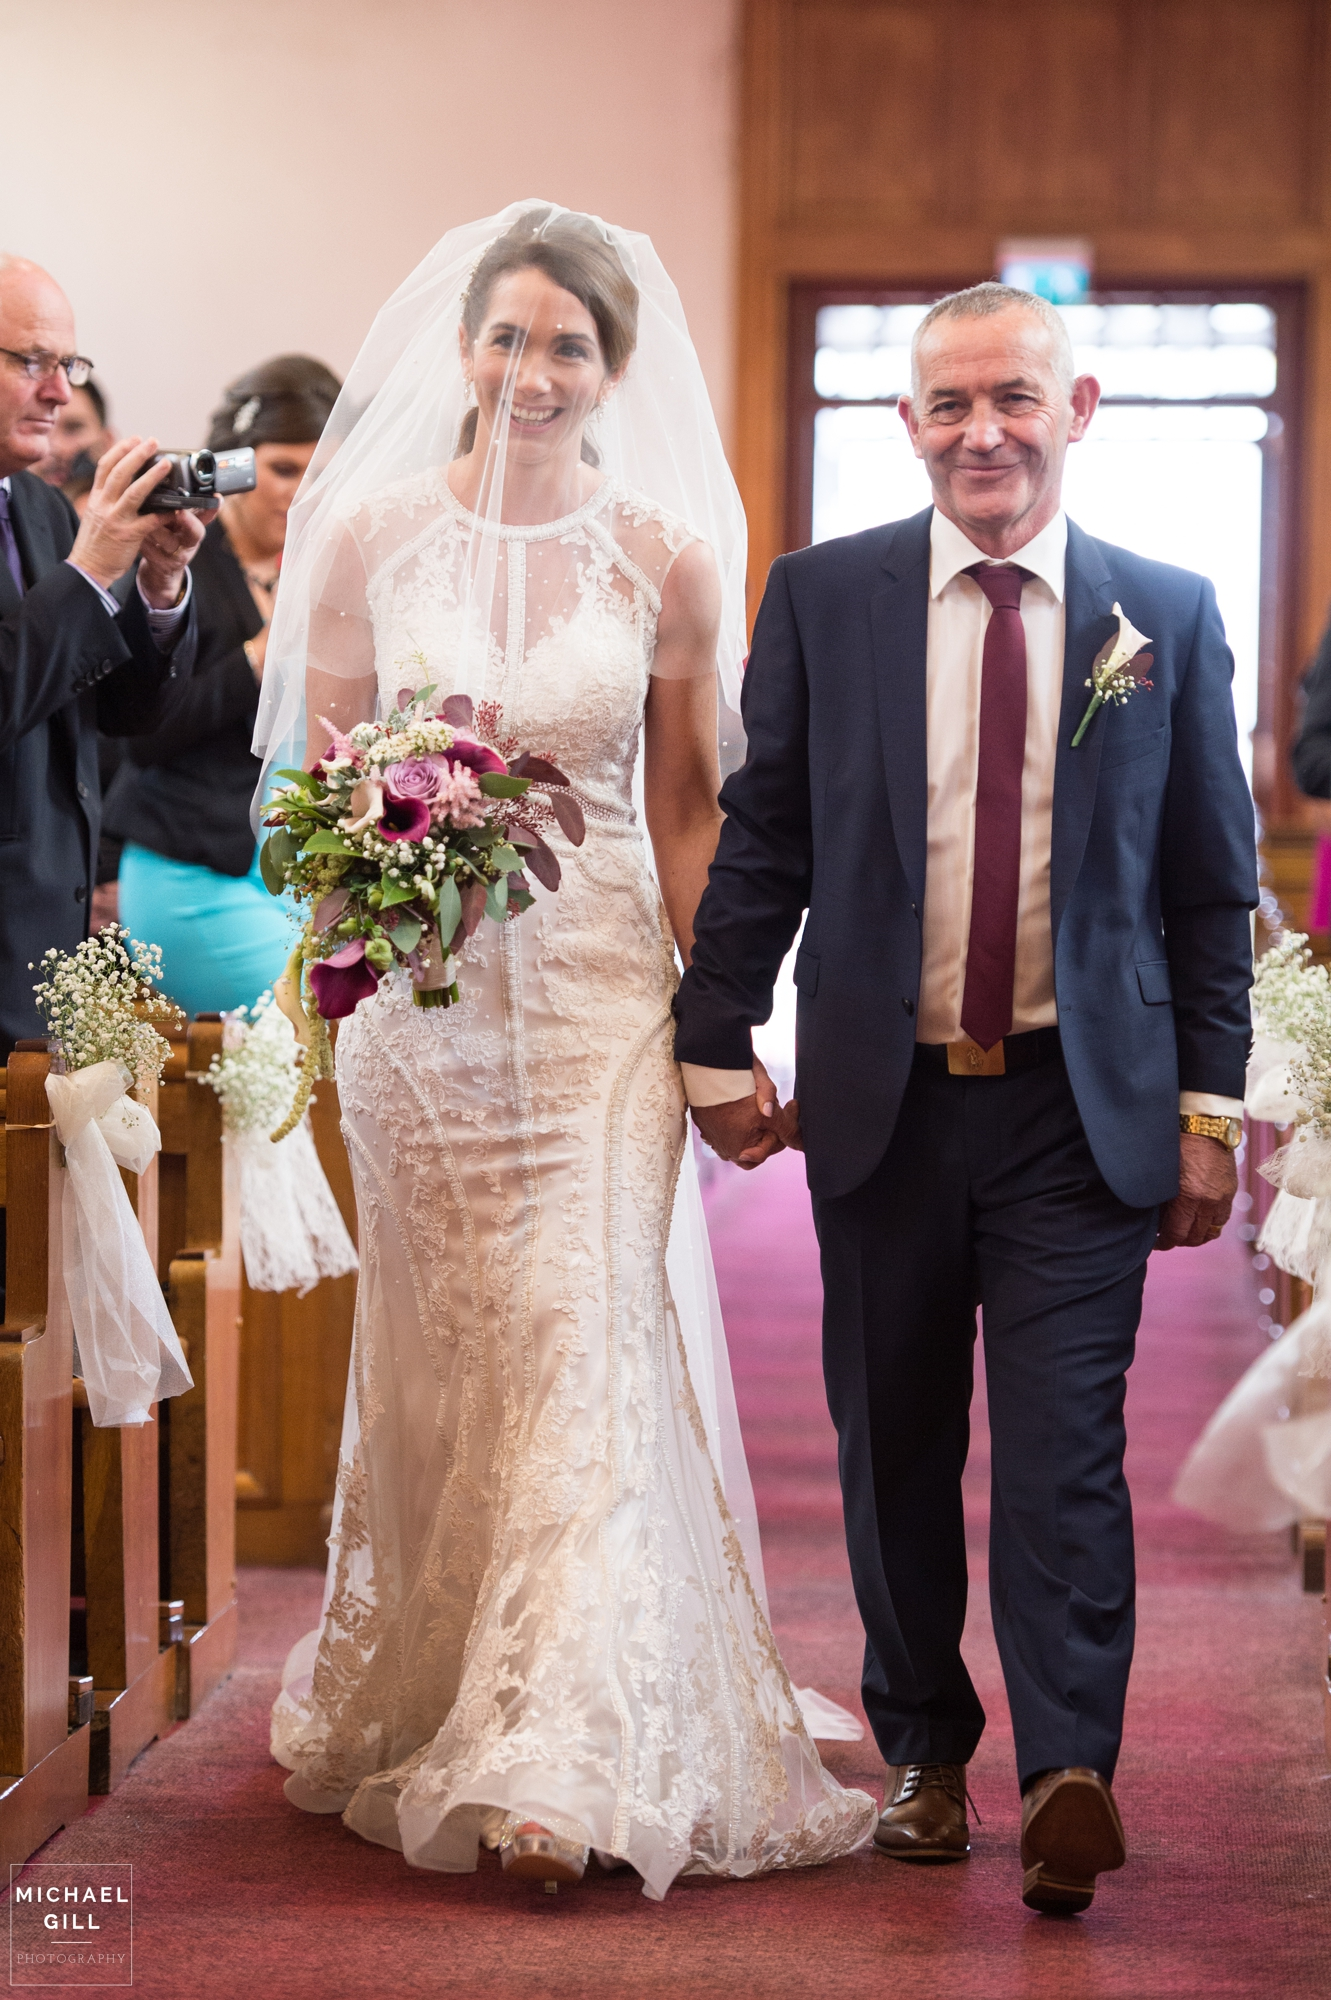 Michael_Gill_Photography_Kinnego_Redcastle_Hotel_Wedding3.jpg